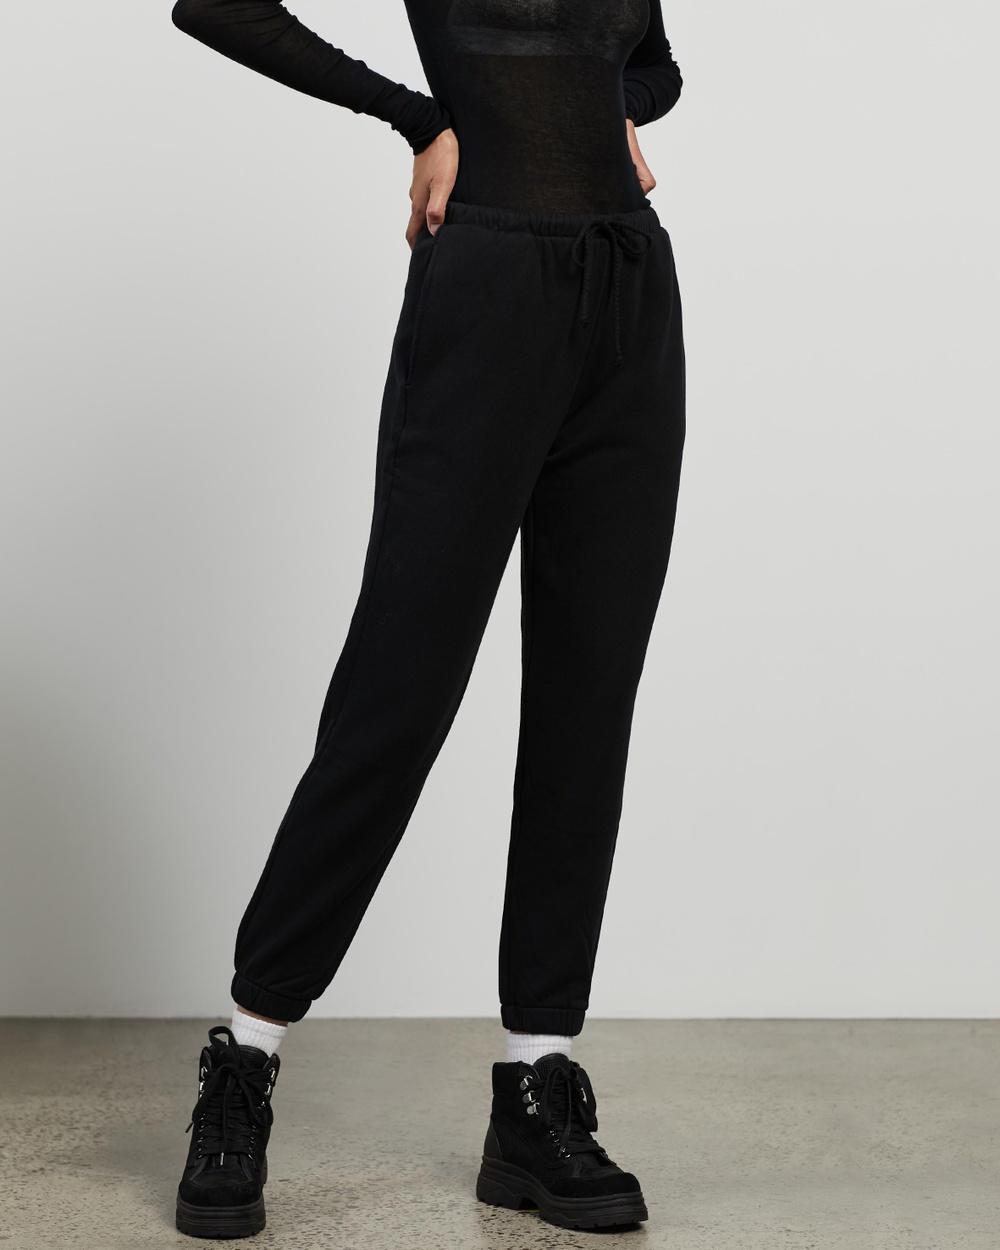 American Vintage Fobye Joggers Sweatpants Vintage Black